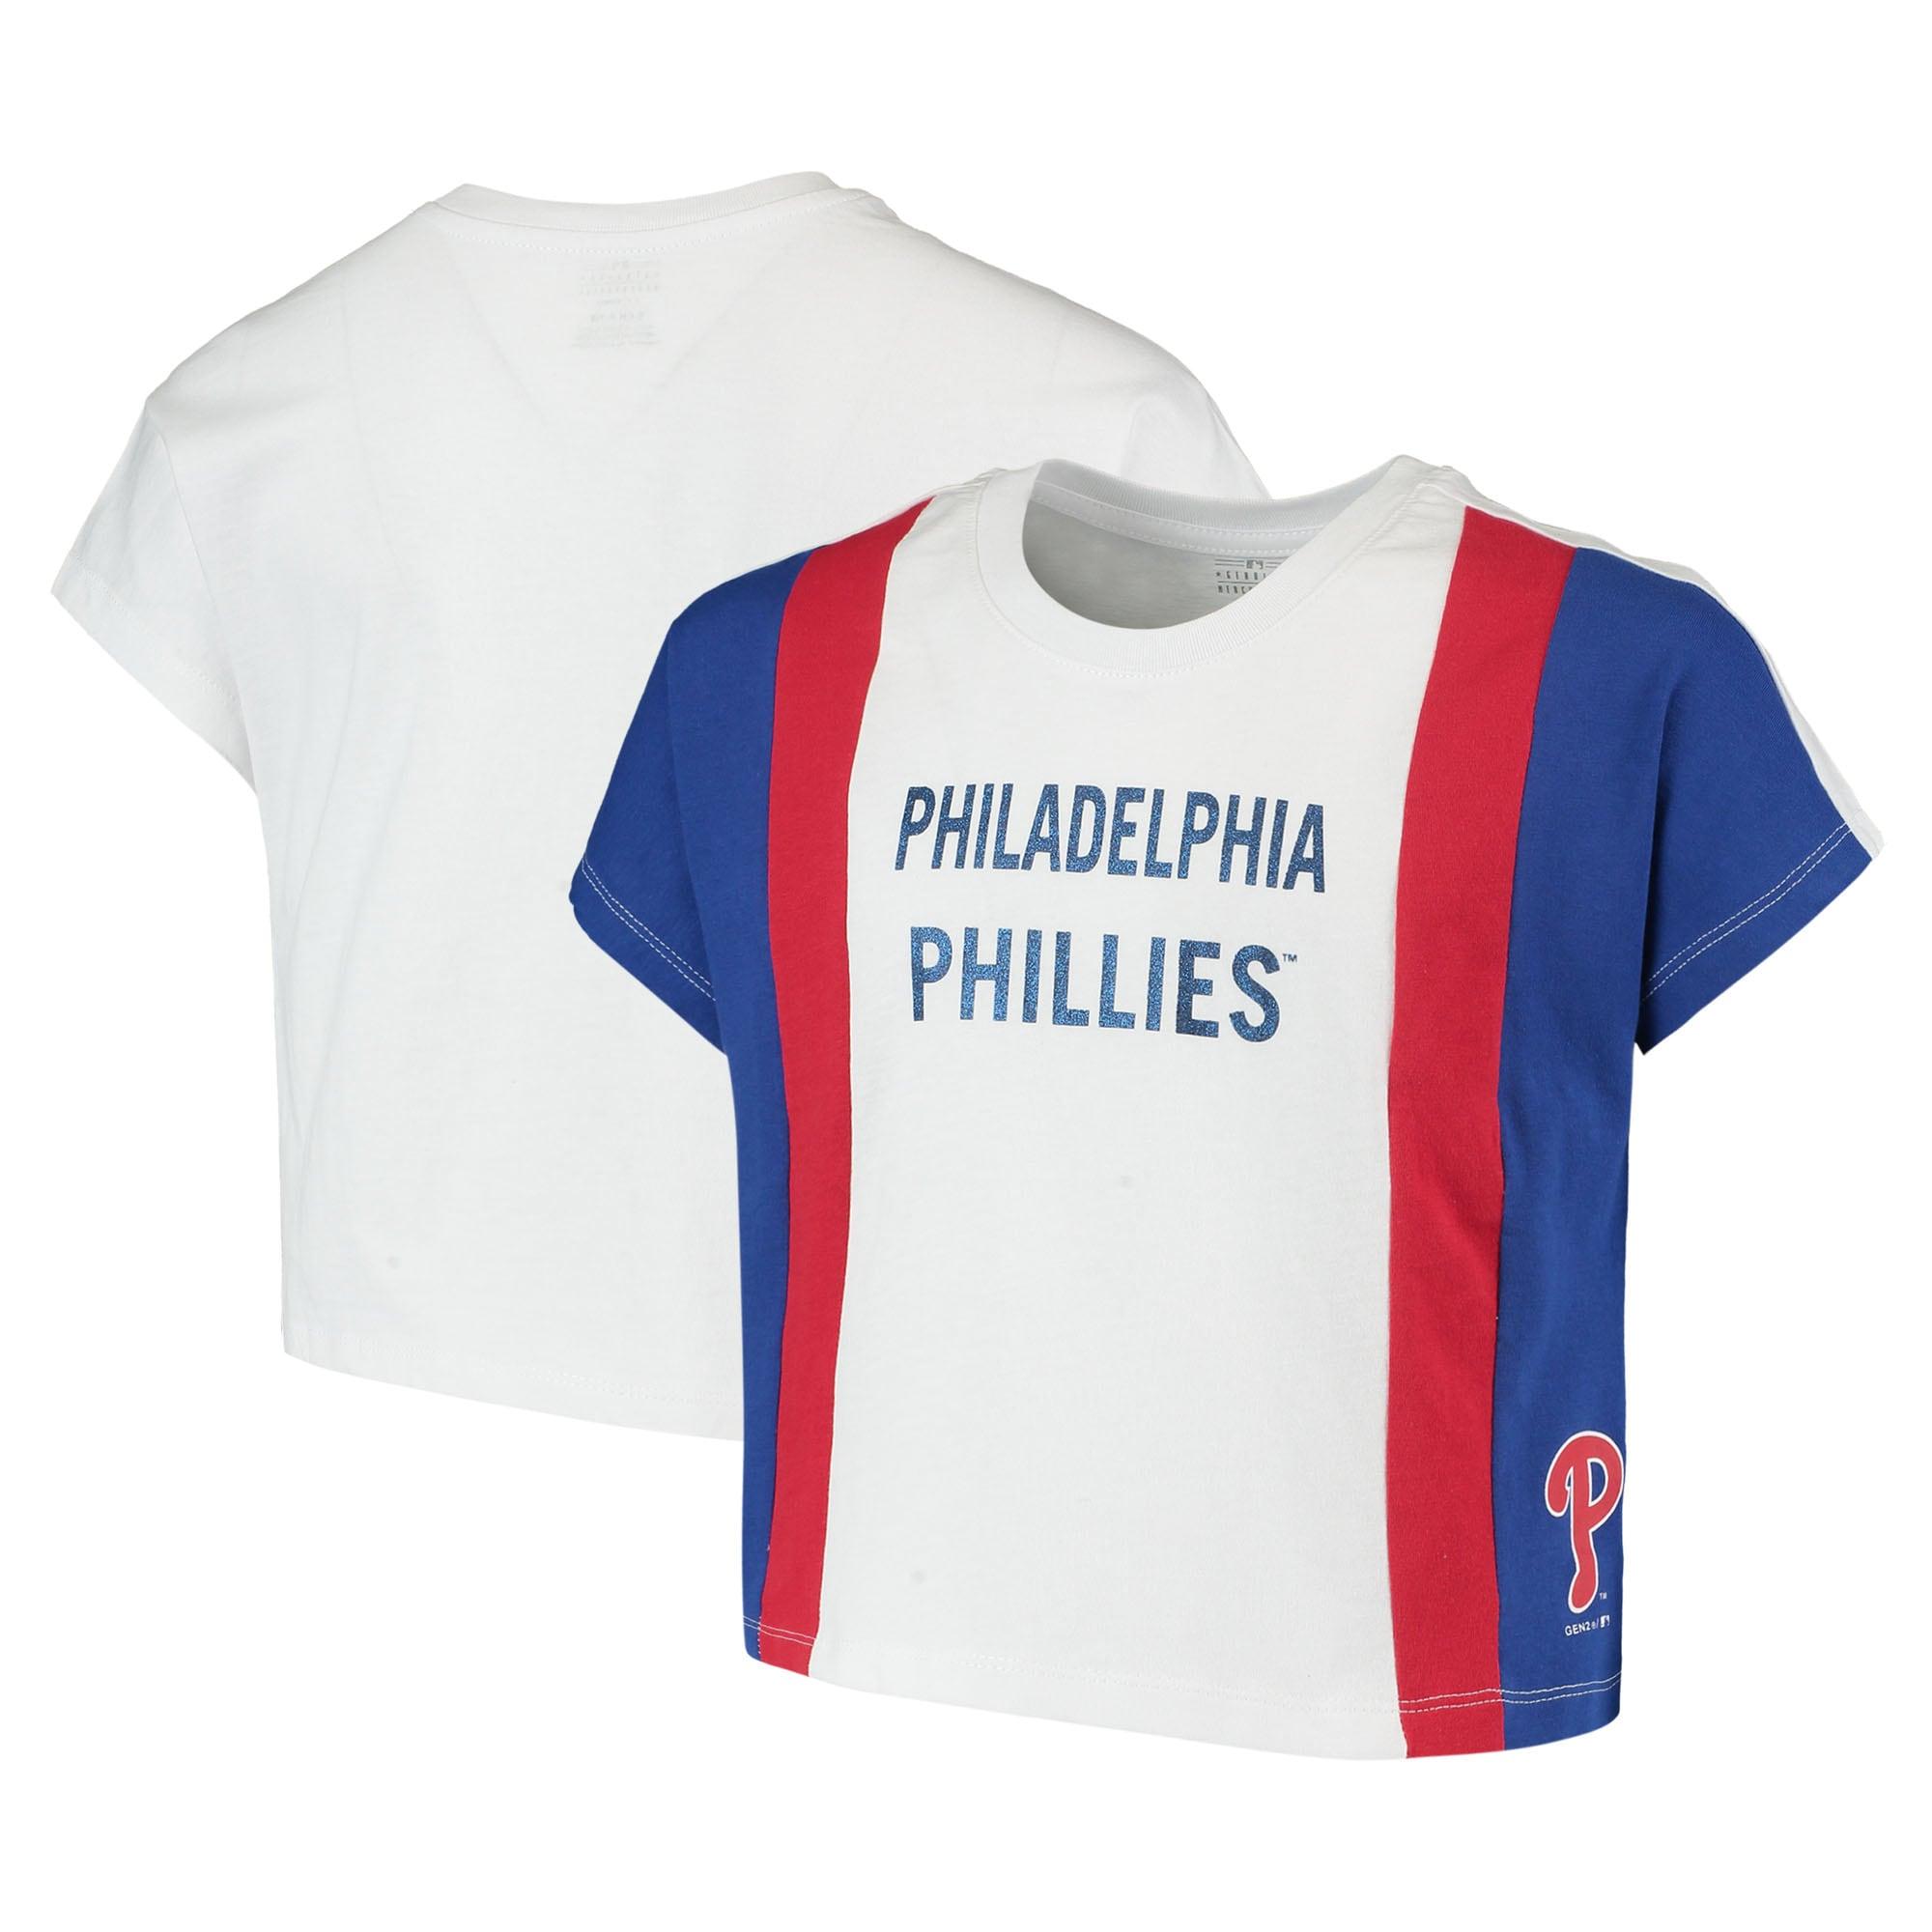 Philadelphia Phillies Girls Youth As If Cropped Boxy T-Shirt - White/Royal